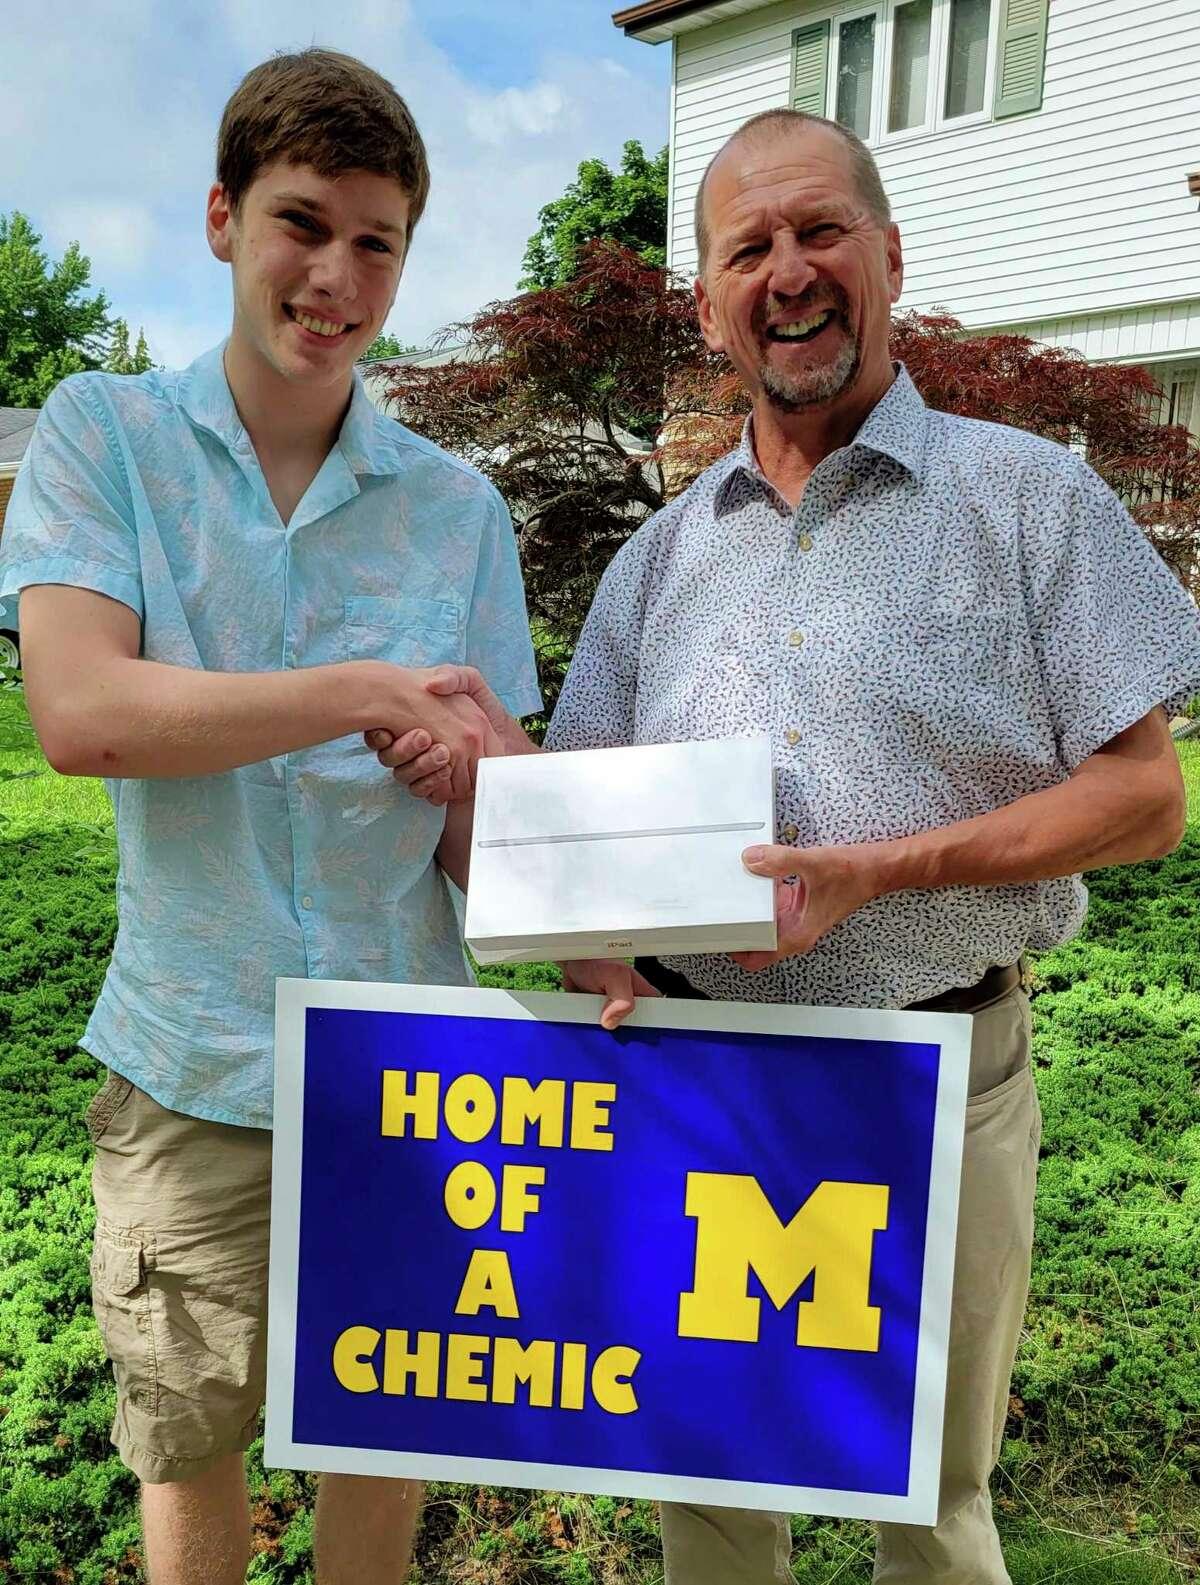 Brendan Weihl, Midland High School Senior and Scott Withrow. (Photo provided)